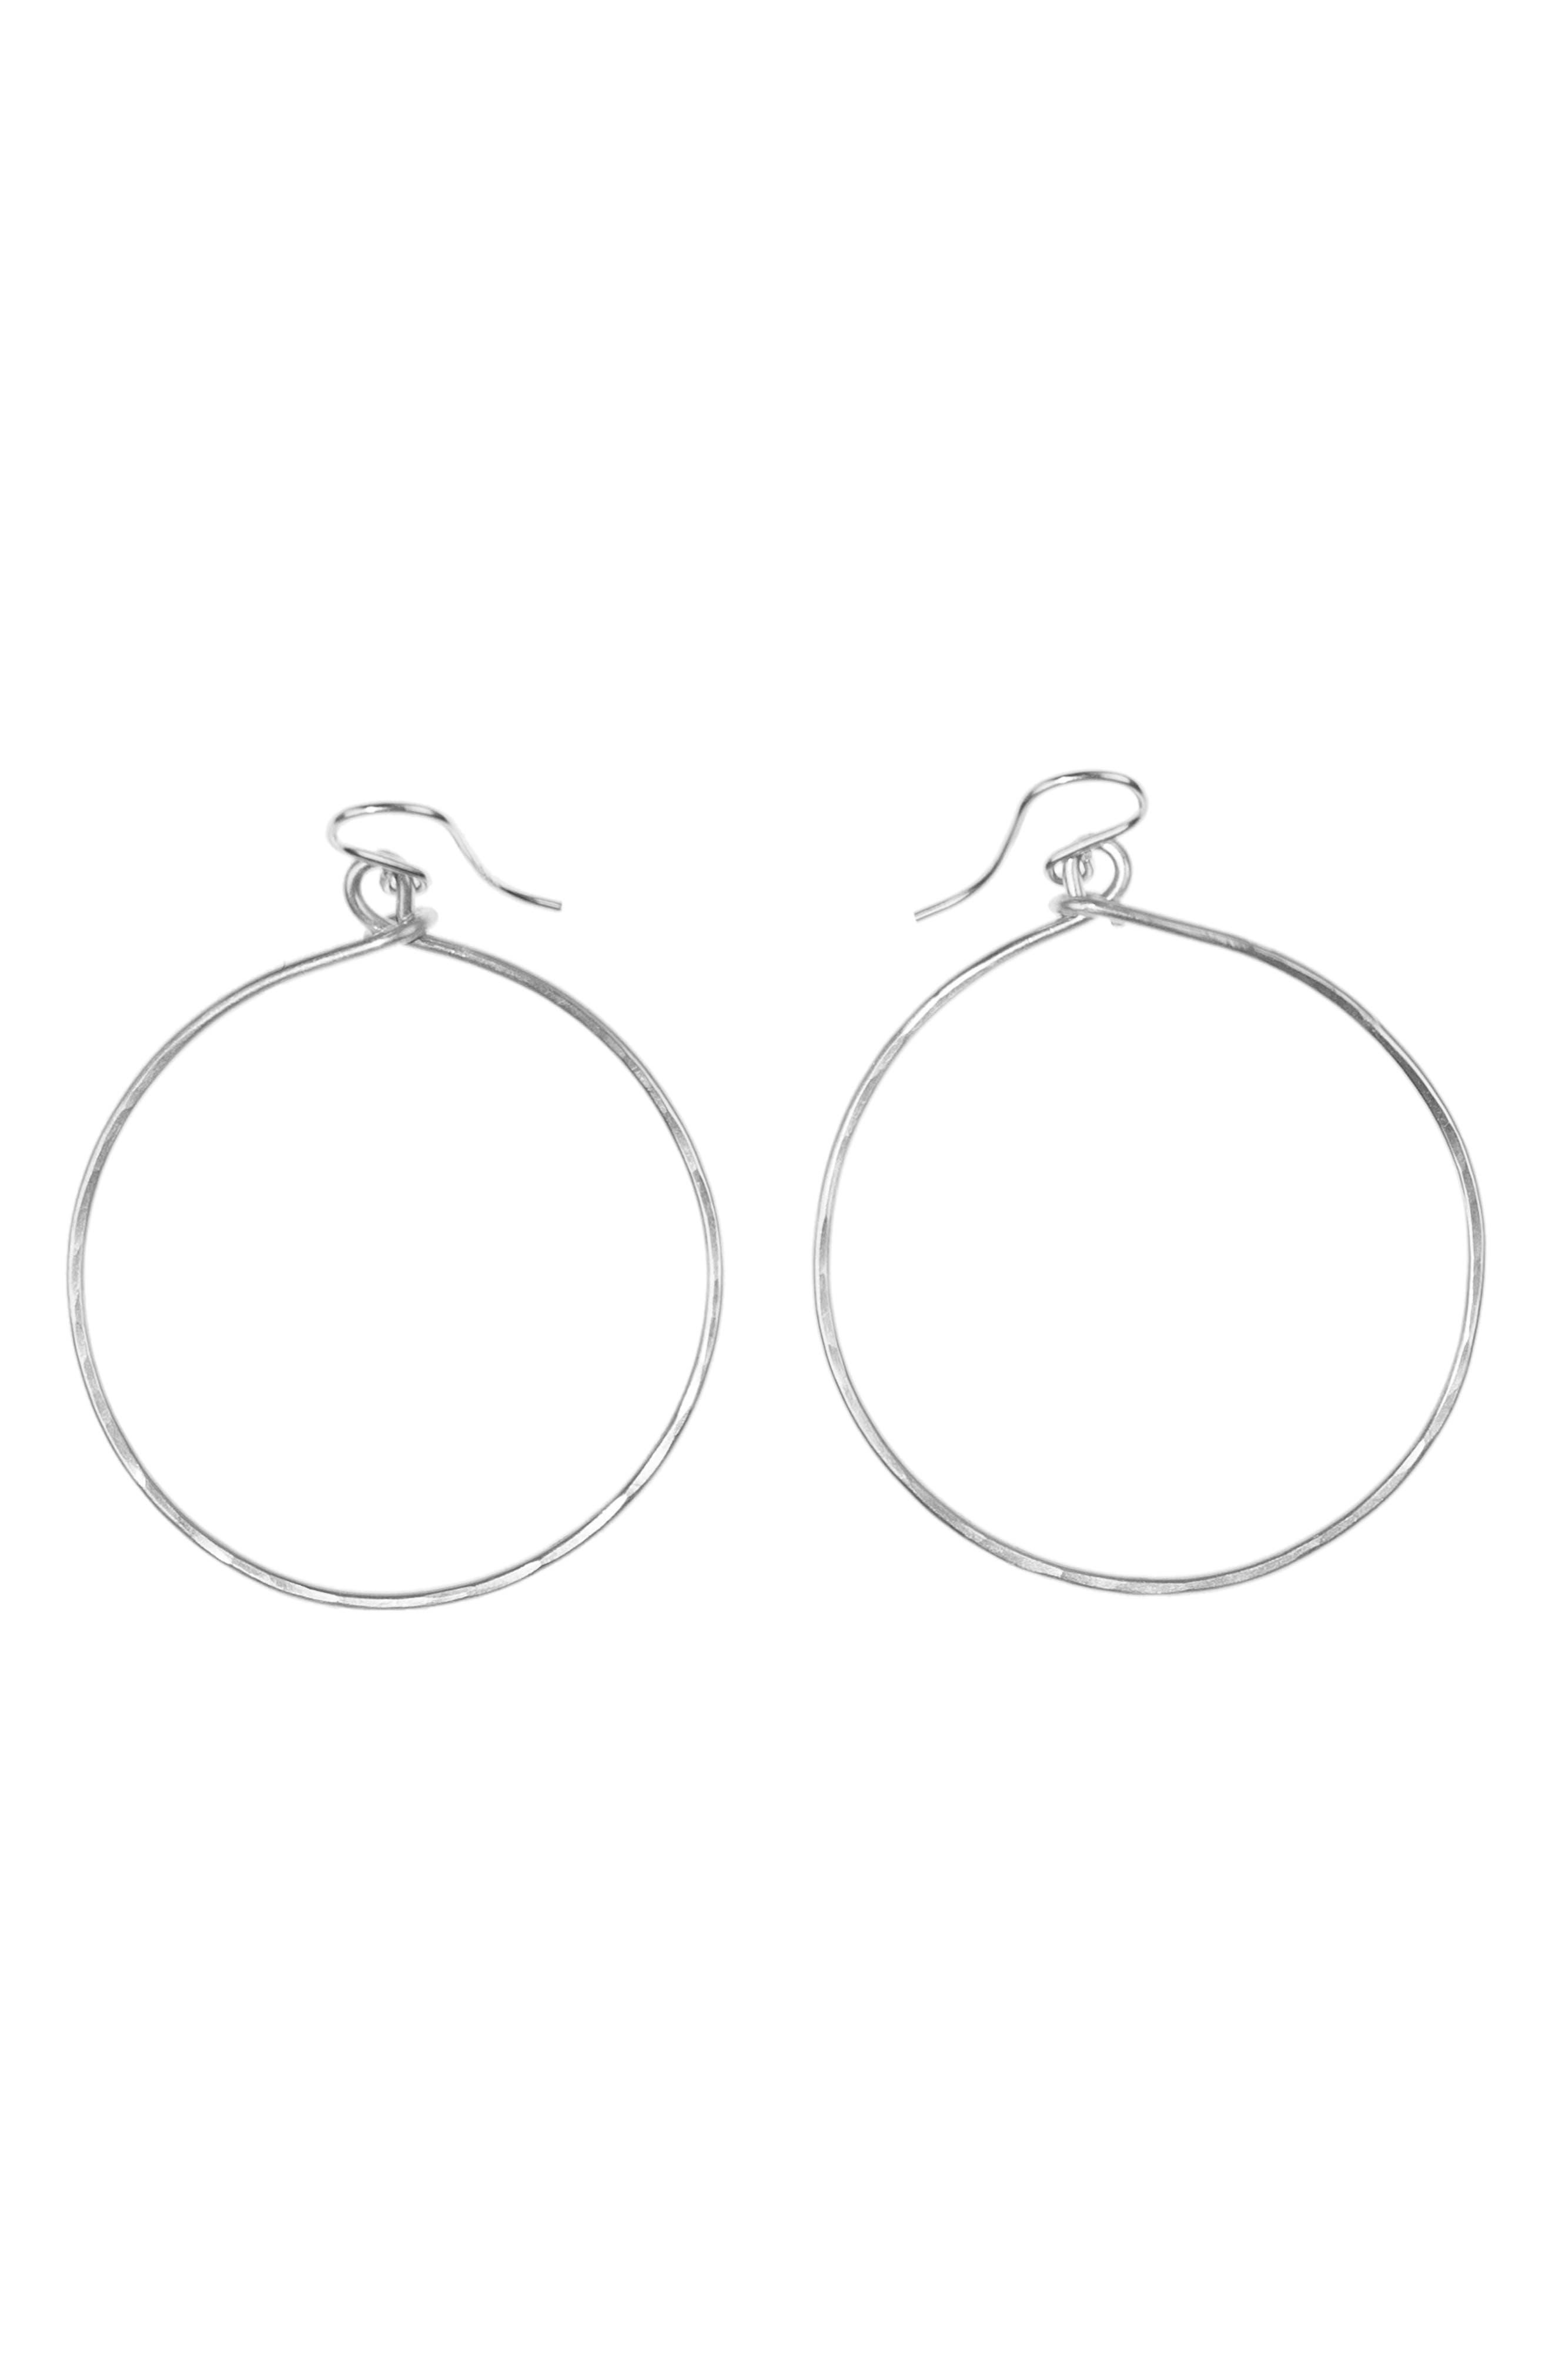 NASHELLE, Medium Loop Earrings, Main thumbnail 1, color, SILVER